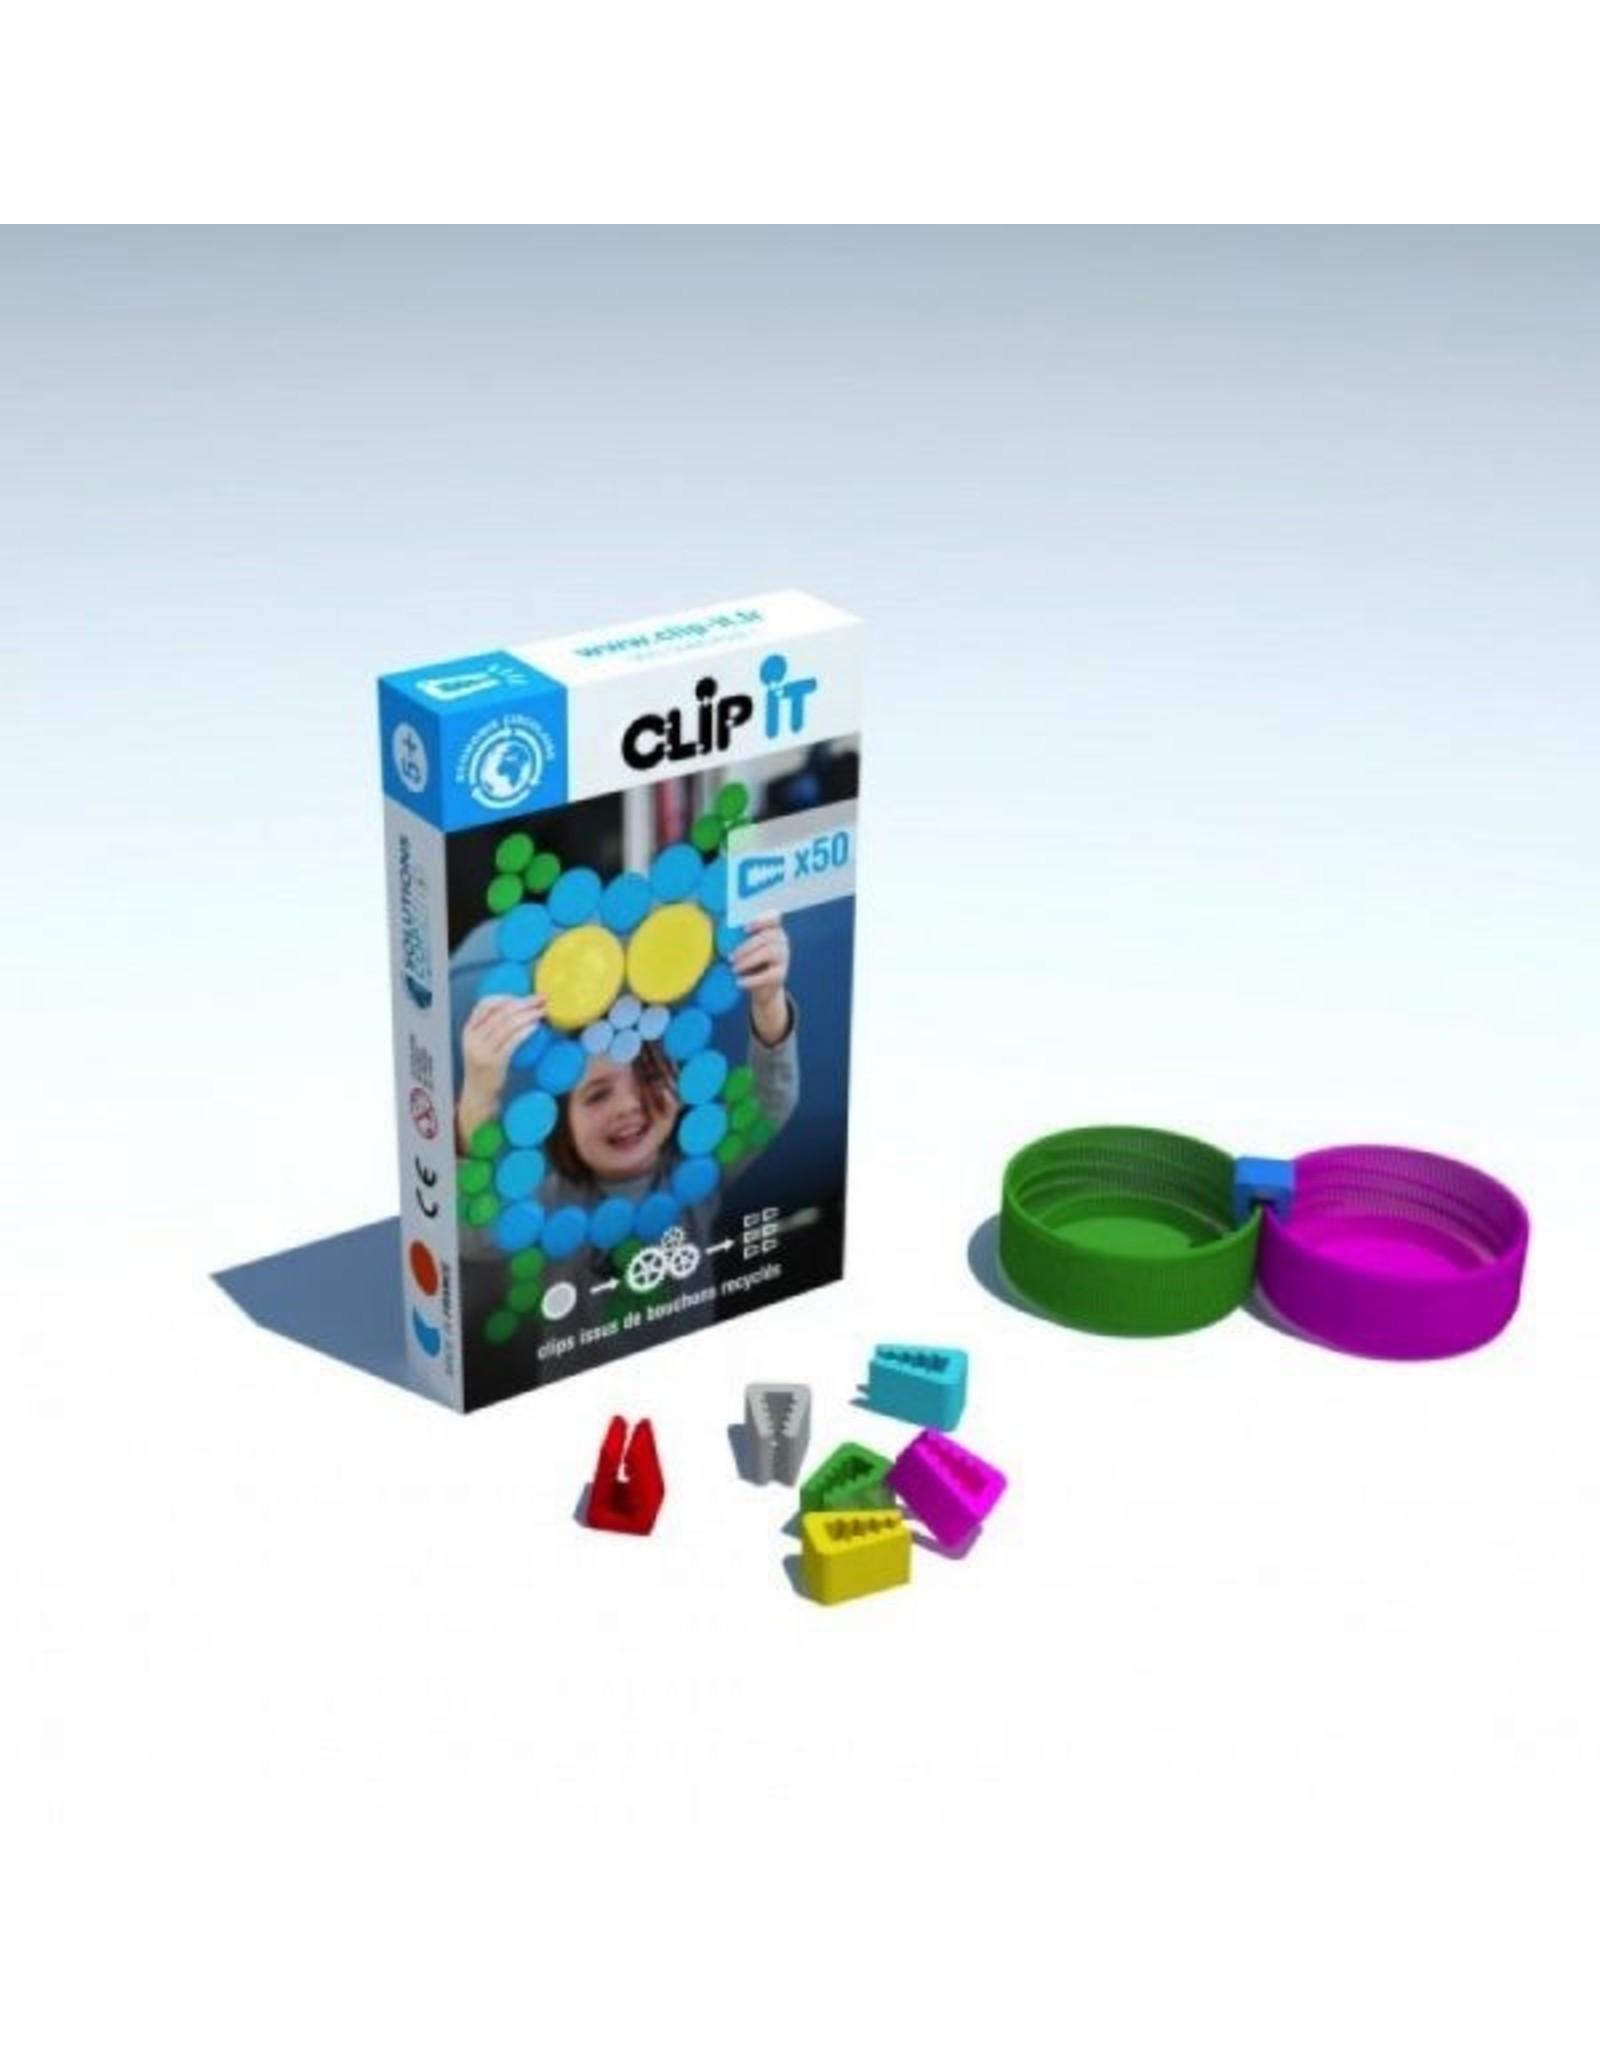 Clip it Clip-it 50 clips - uil